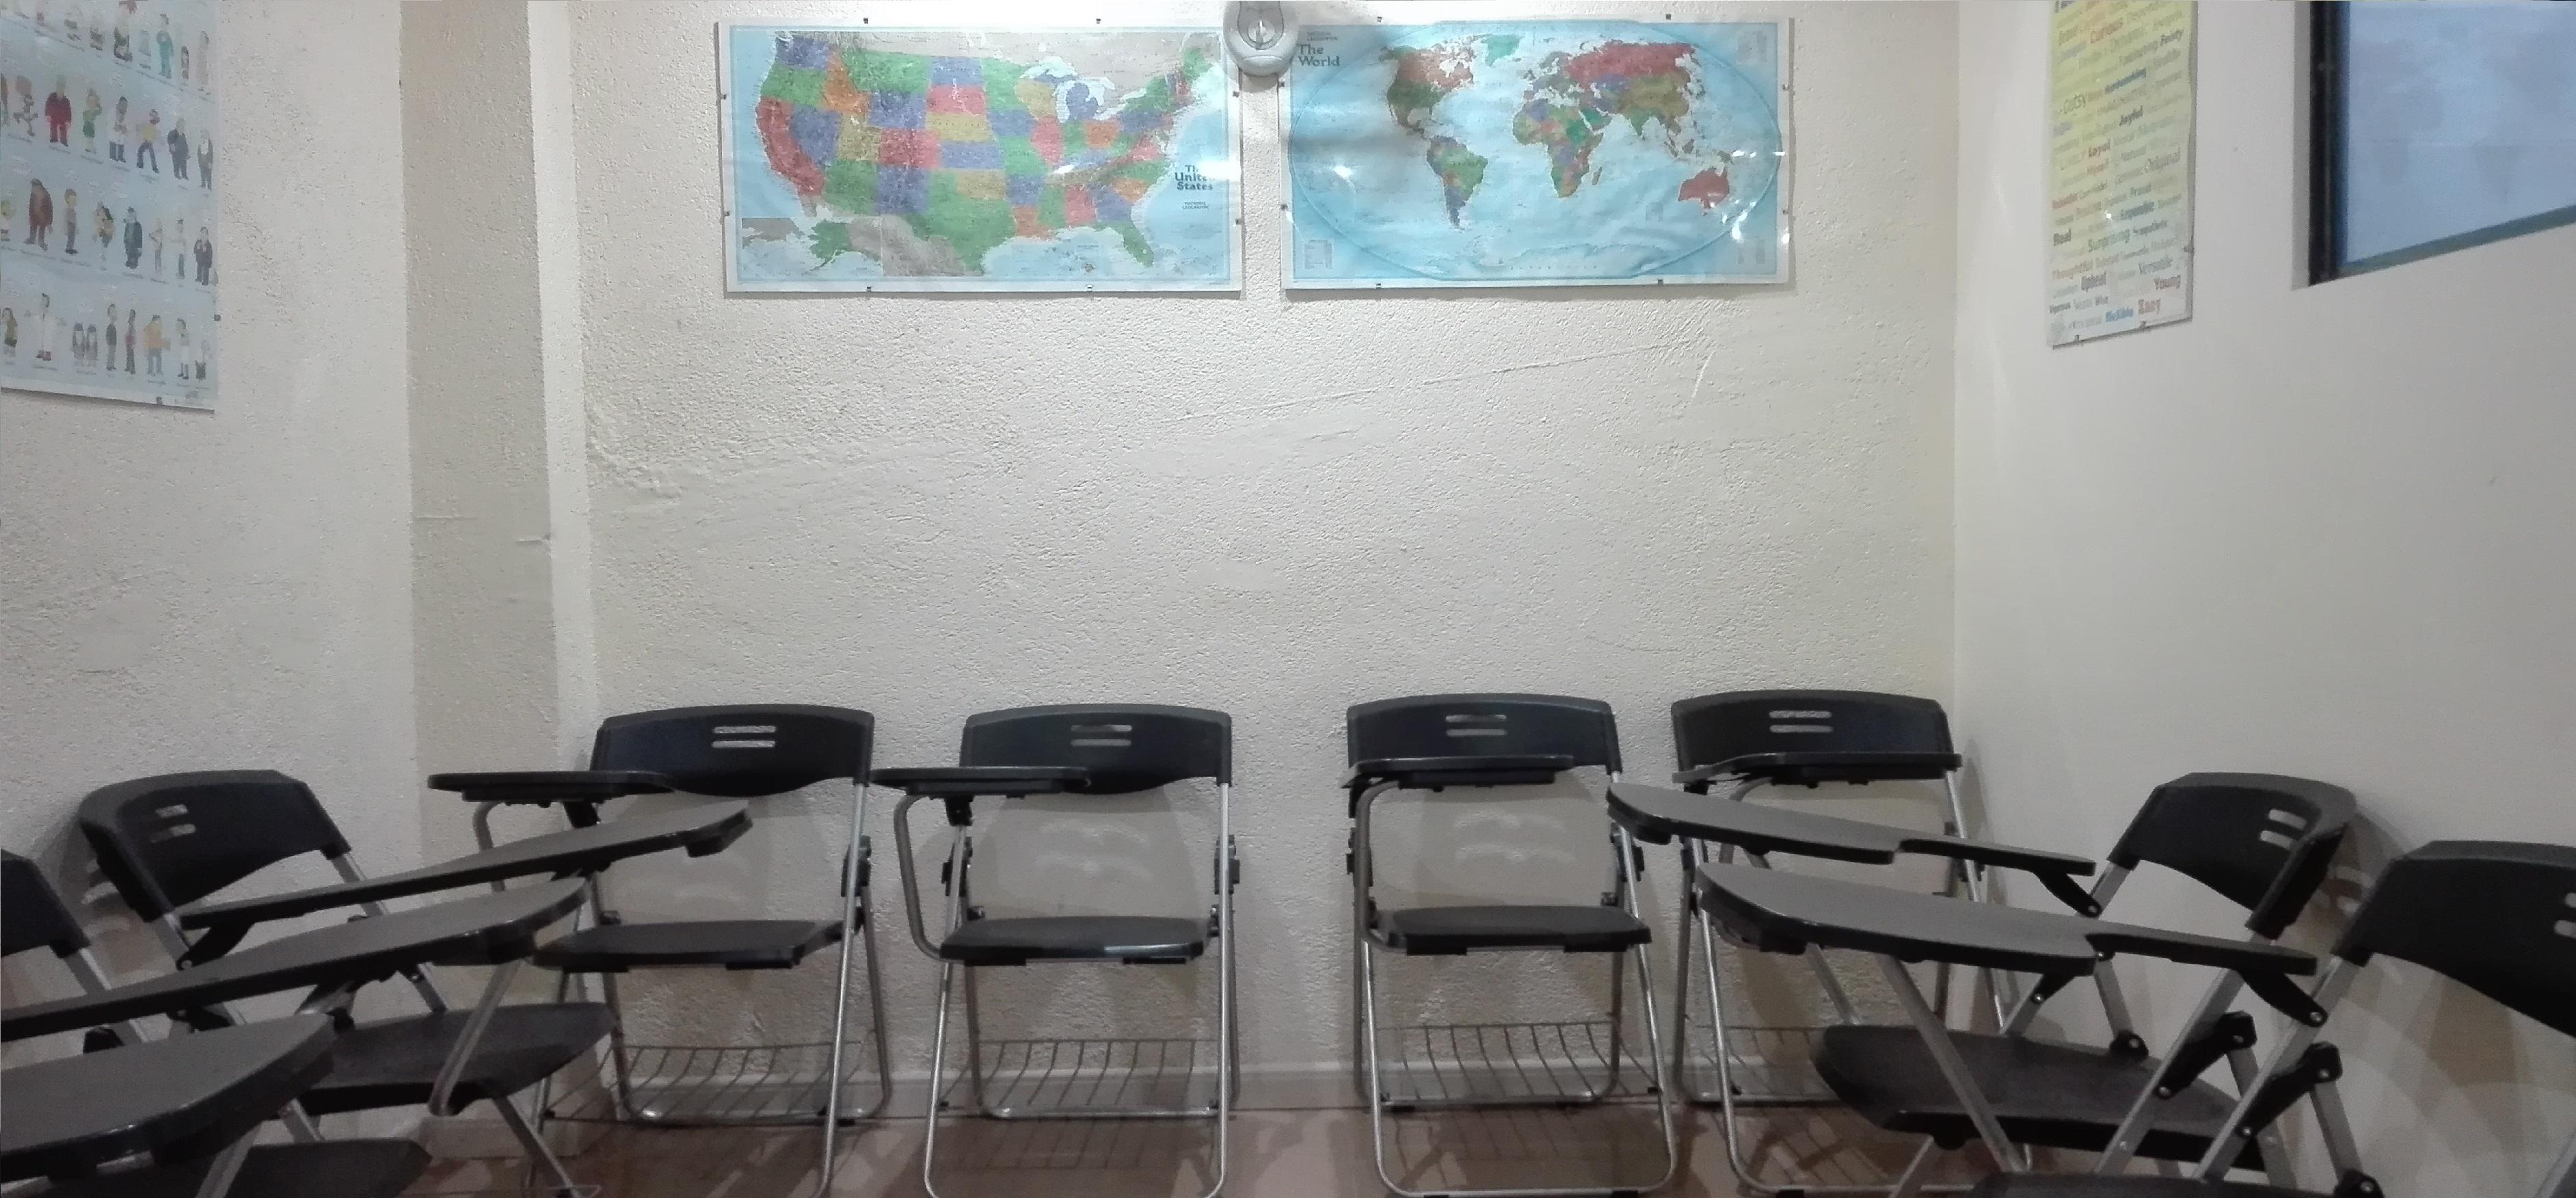 Clases de inglés en zona (USERA) - Madrid